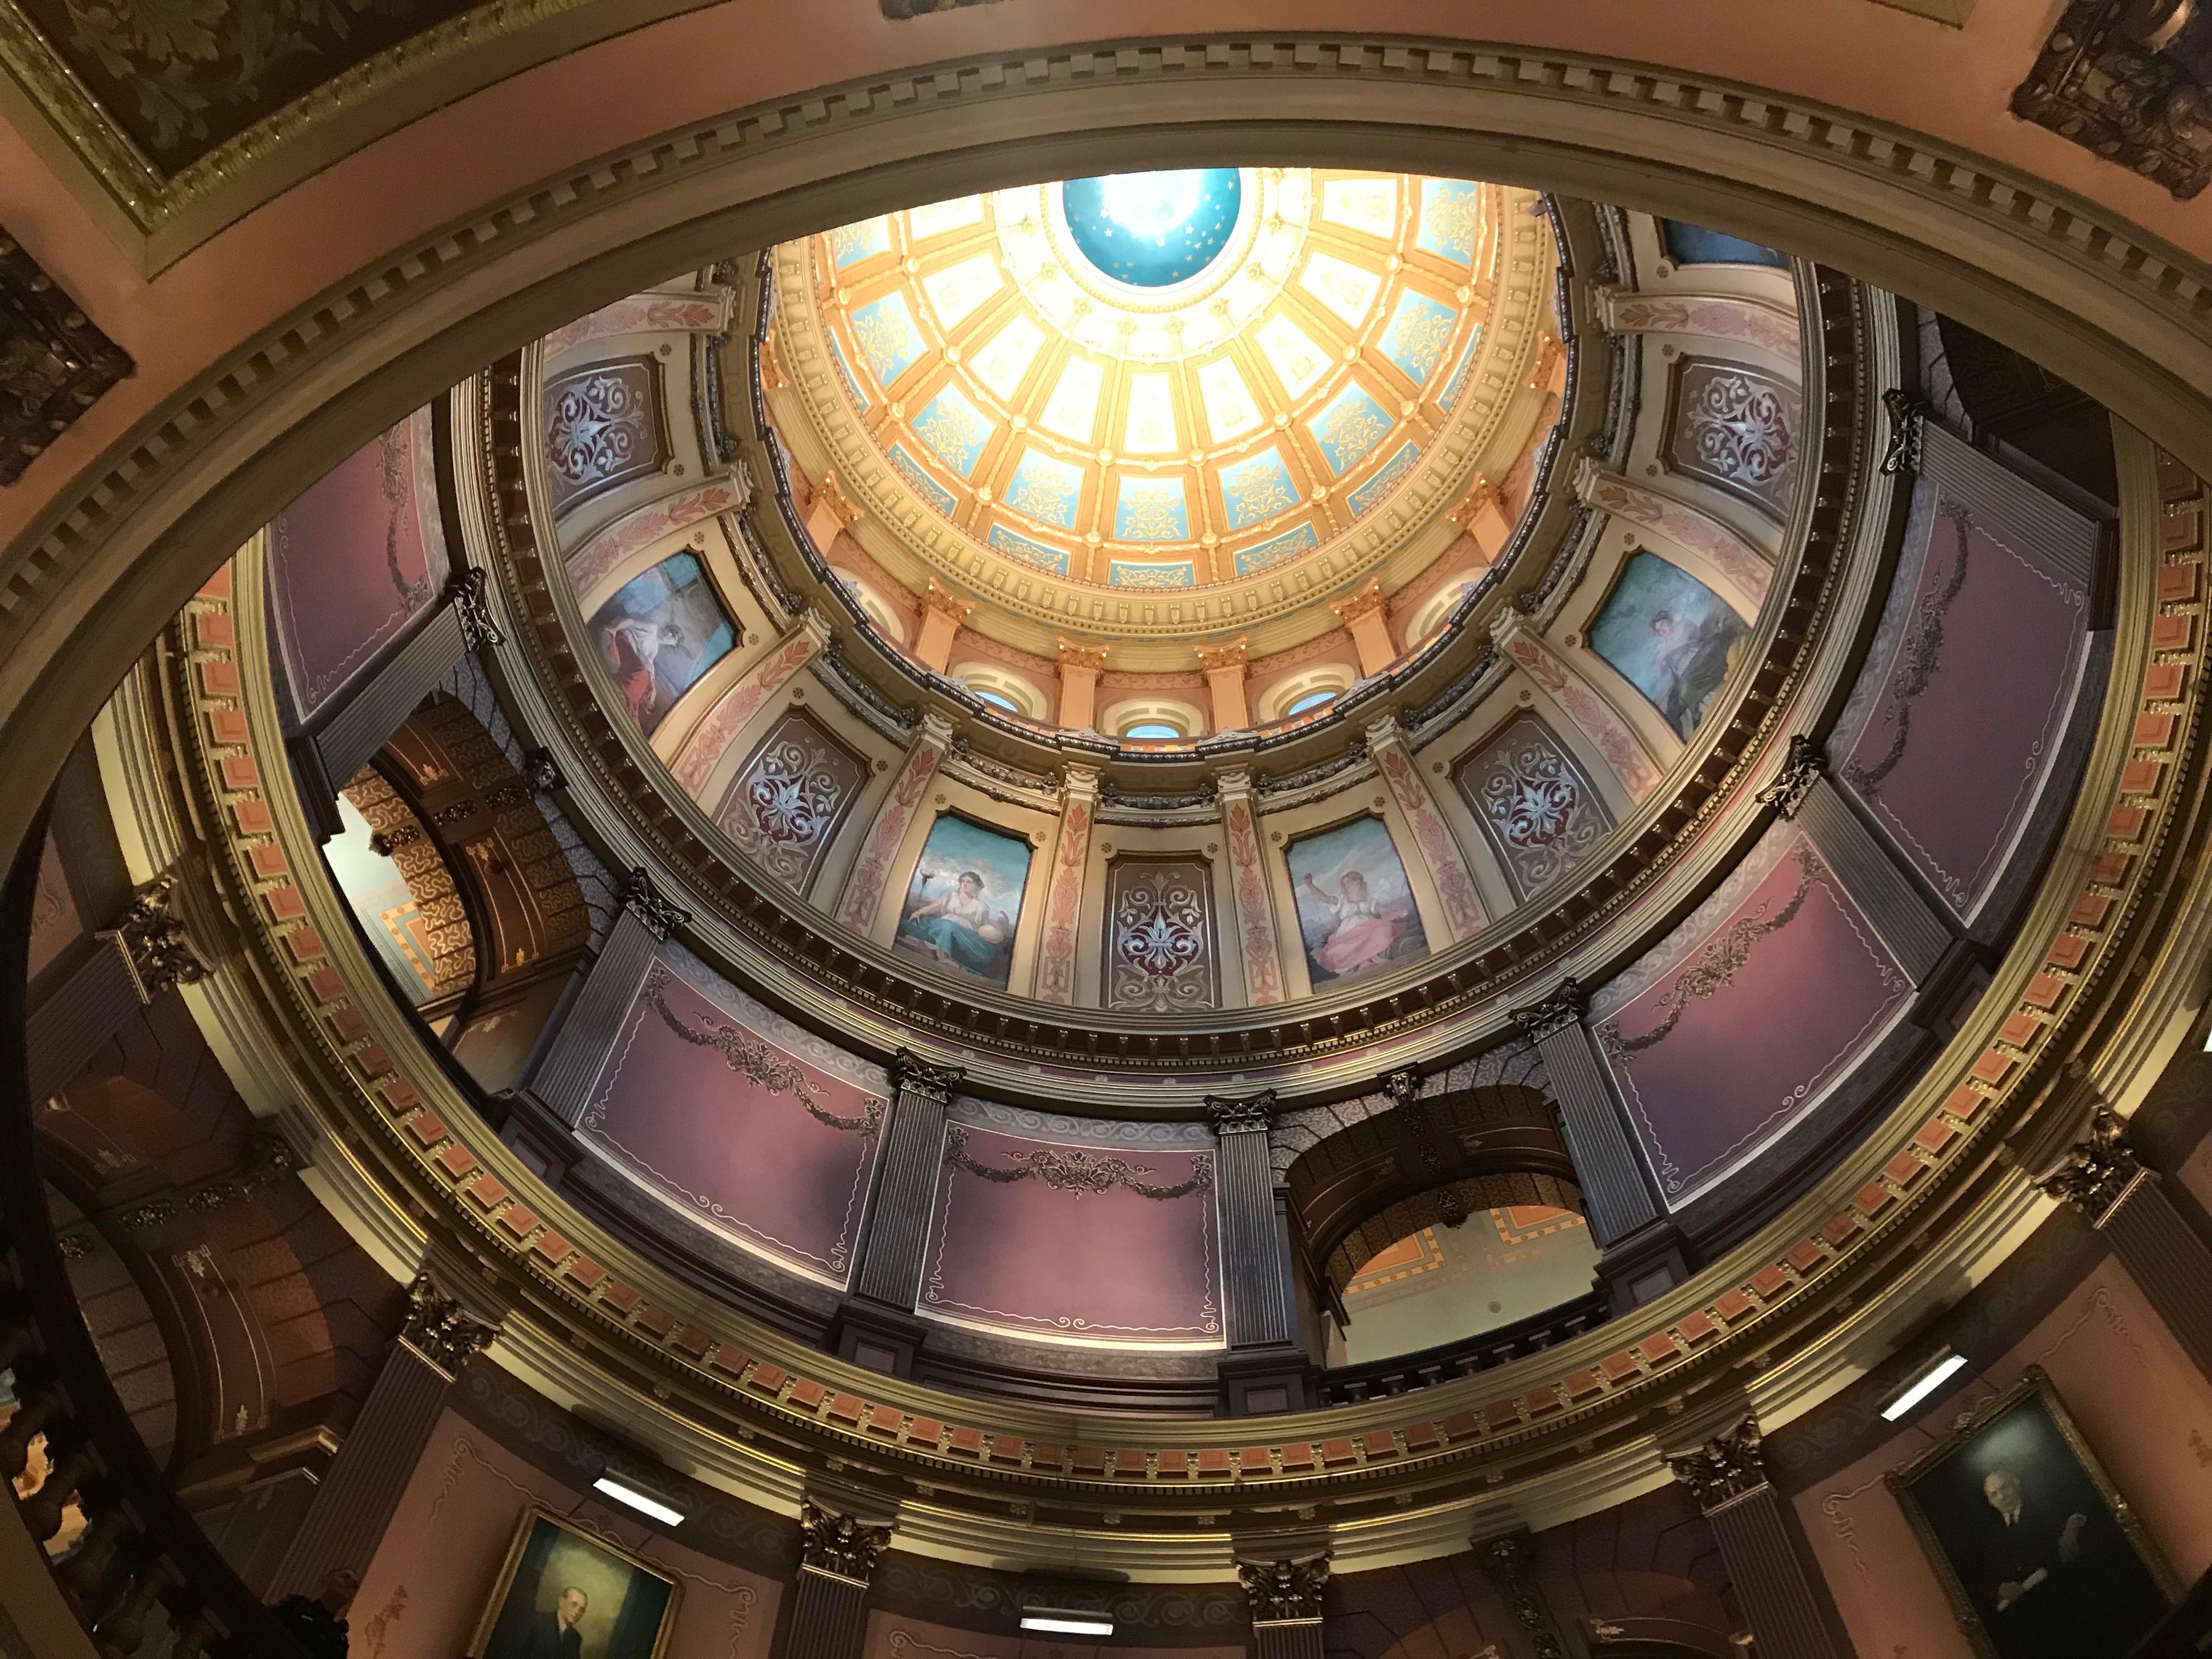 Supreme Court pauses 2020 redistricting order in Michigan gerrymandering case